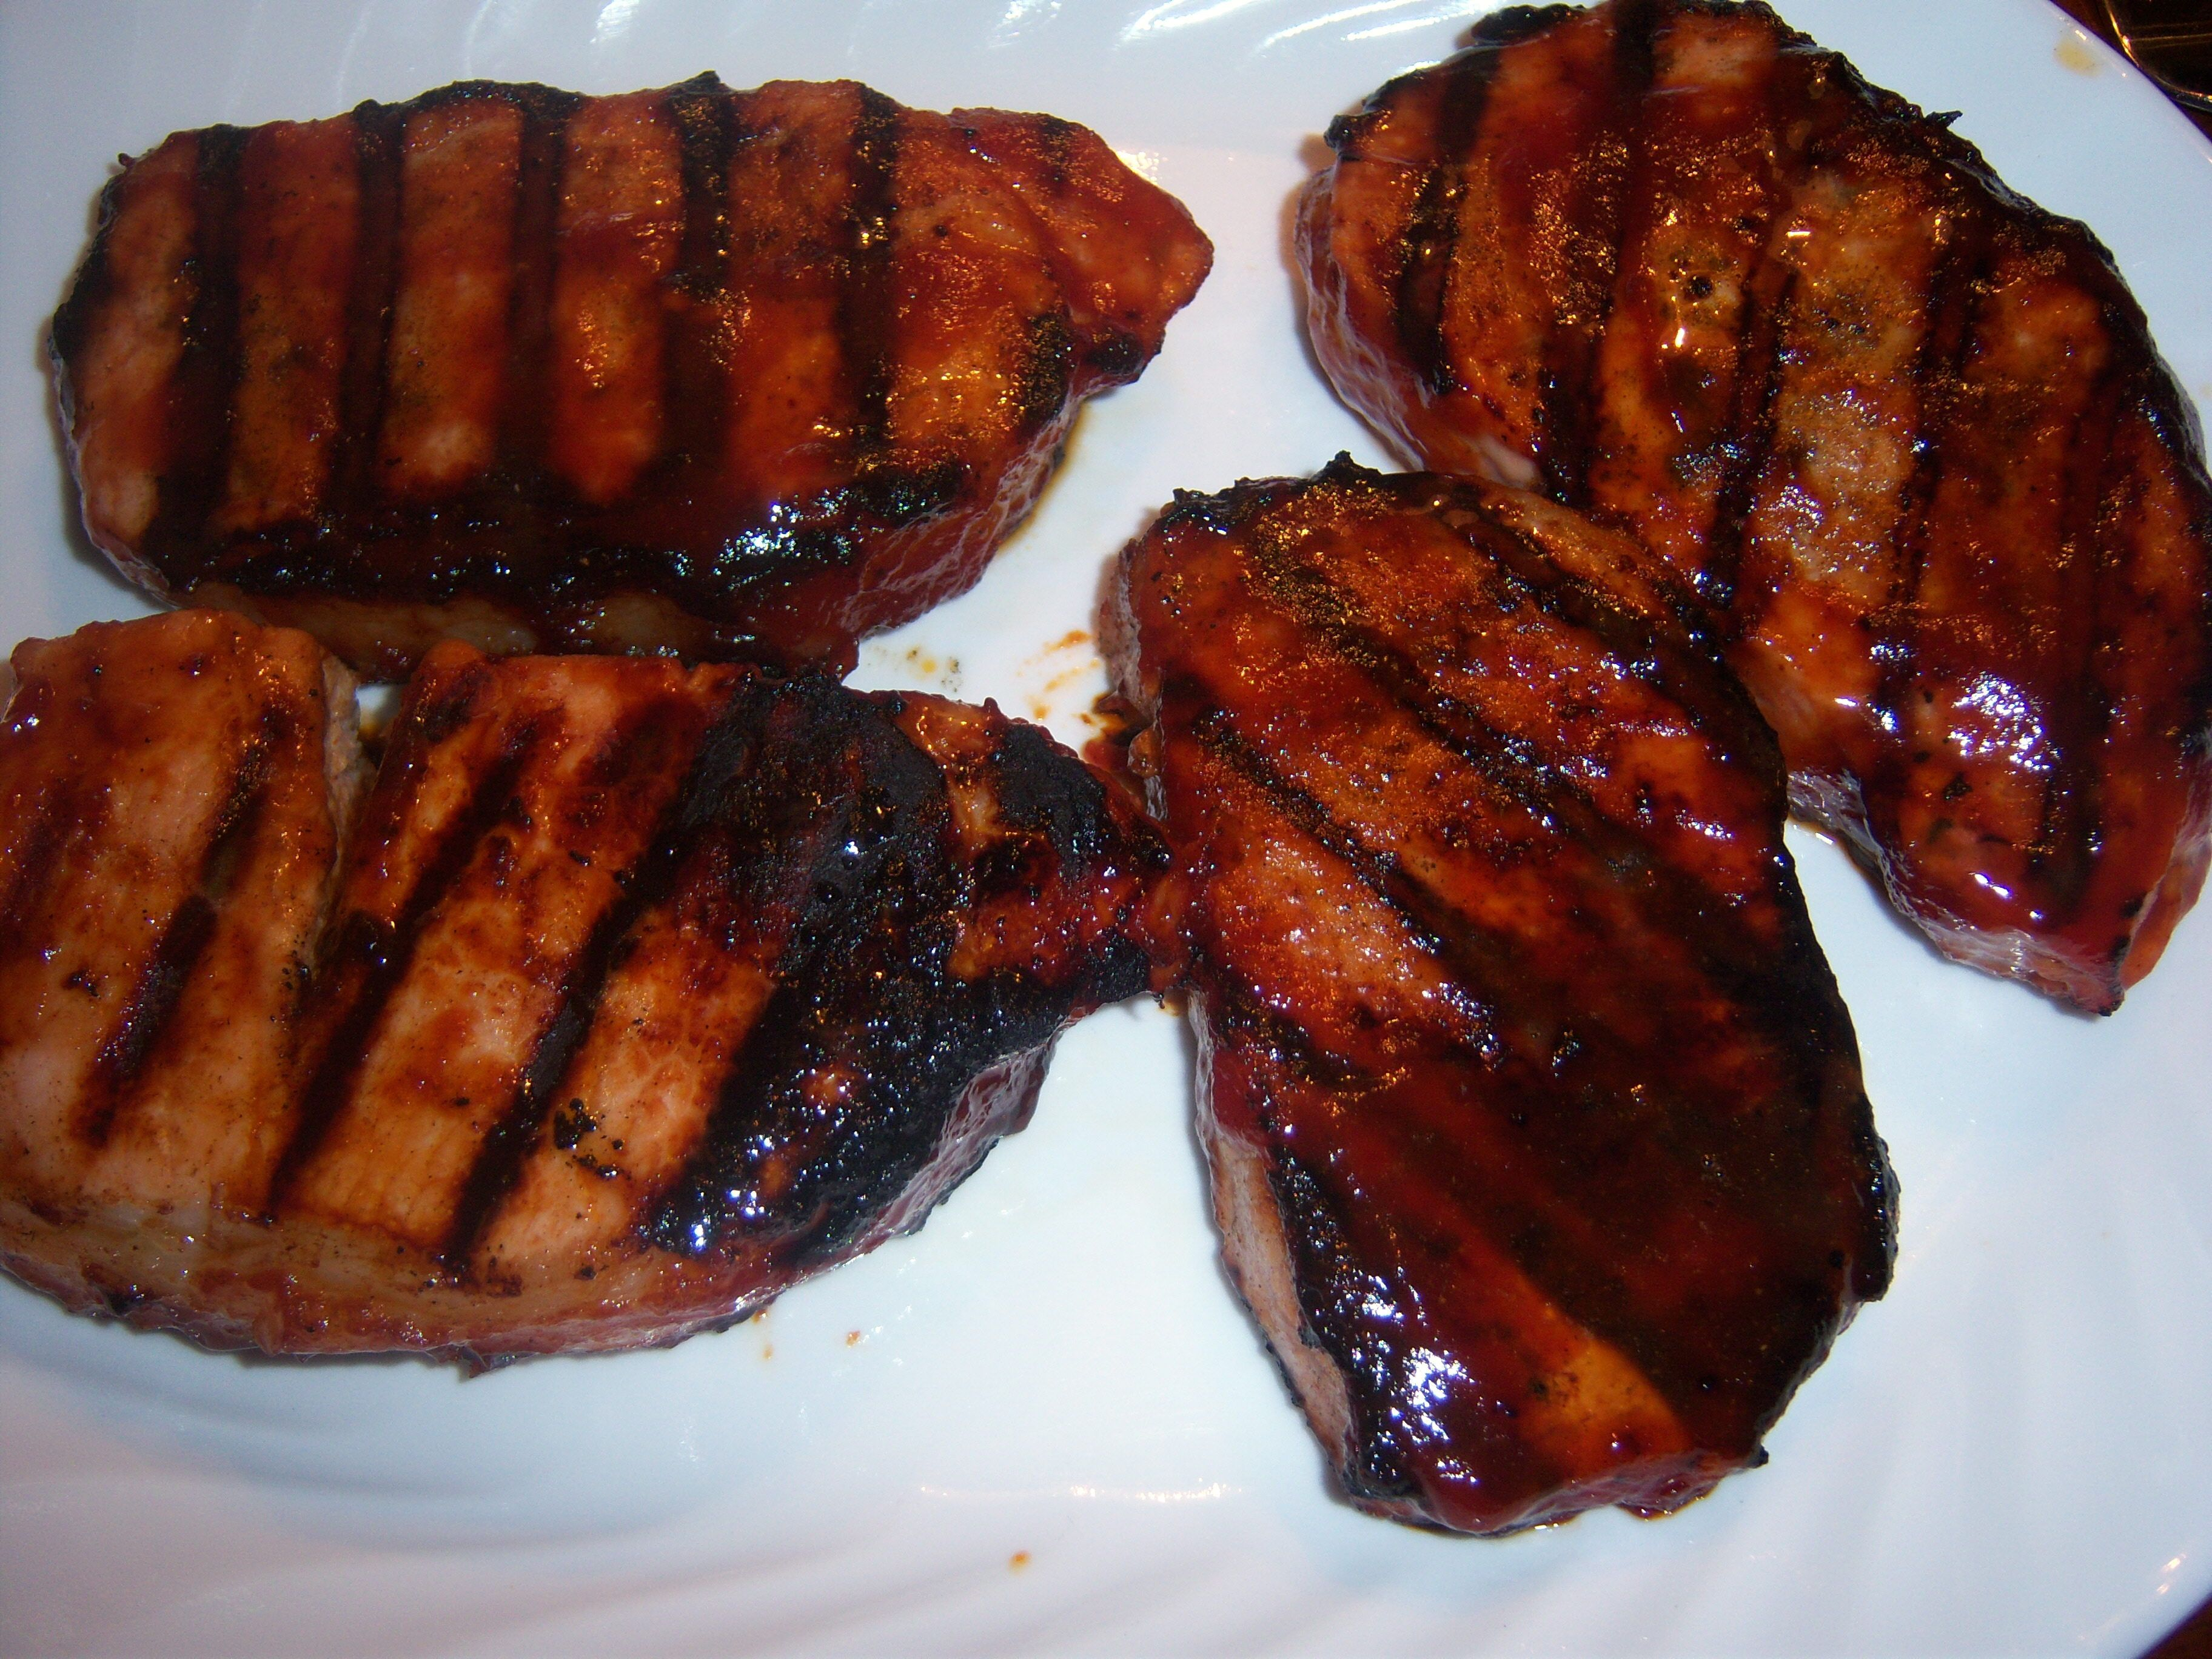 Ingredients: 34 Bonein Pork Chops (1 Lb), · Microwave Grillmicrowave